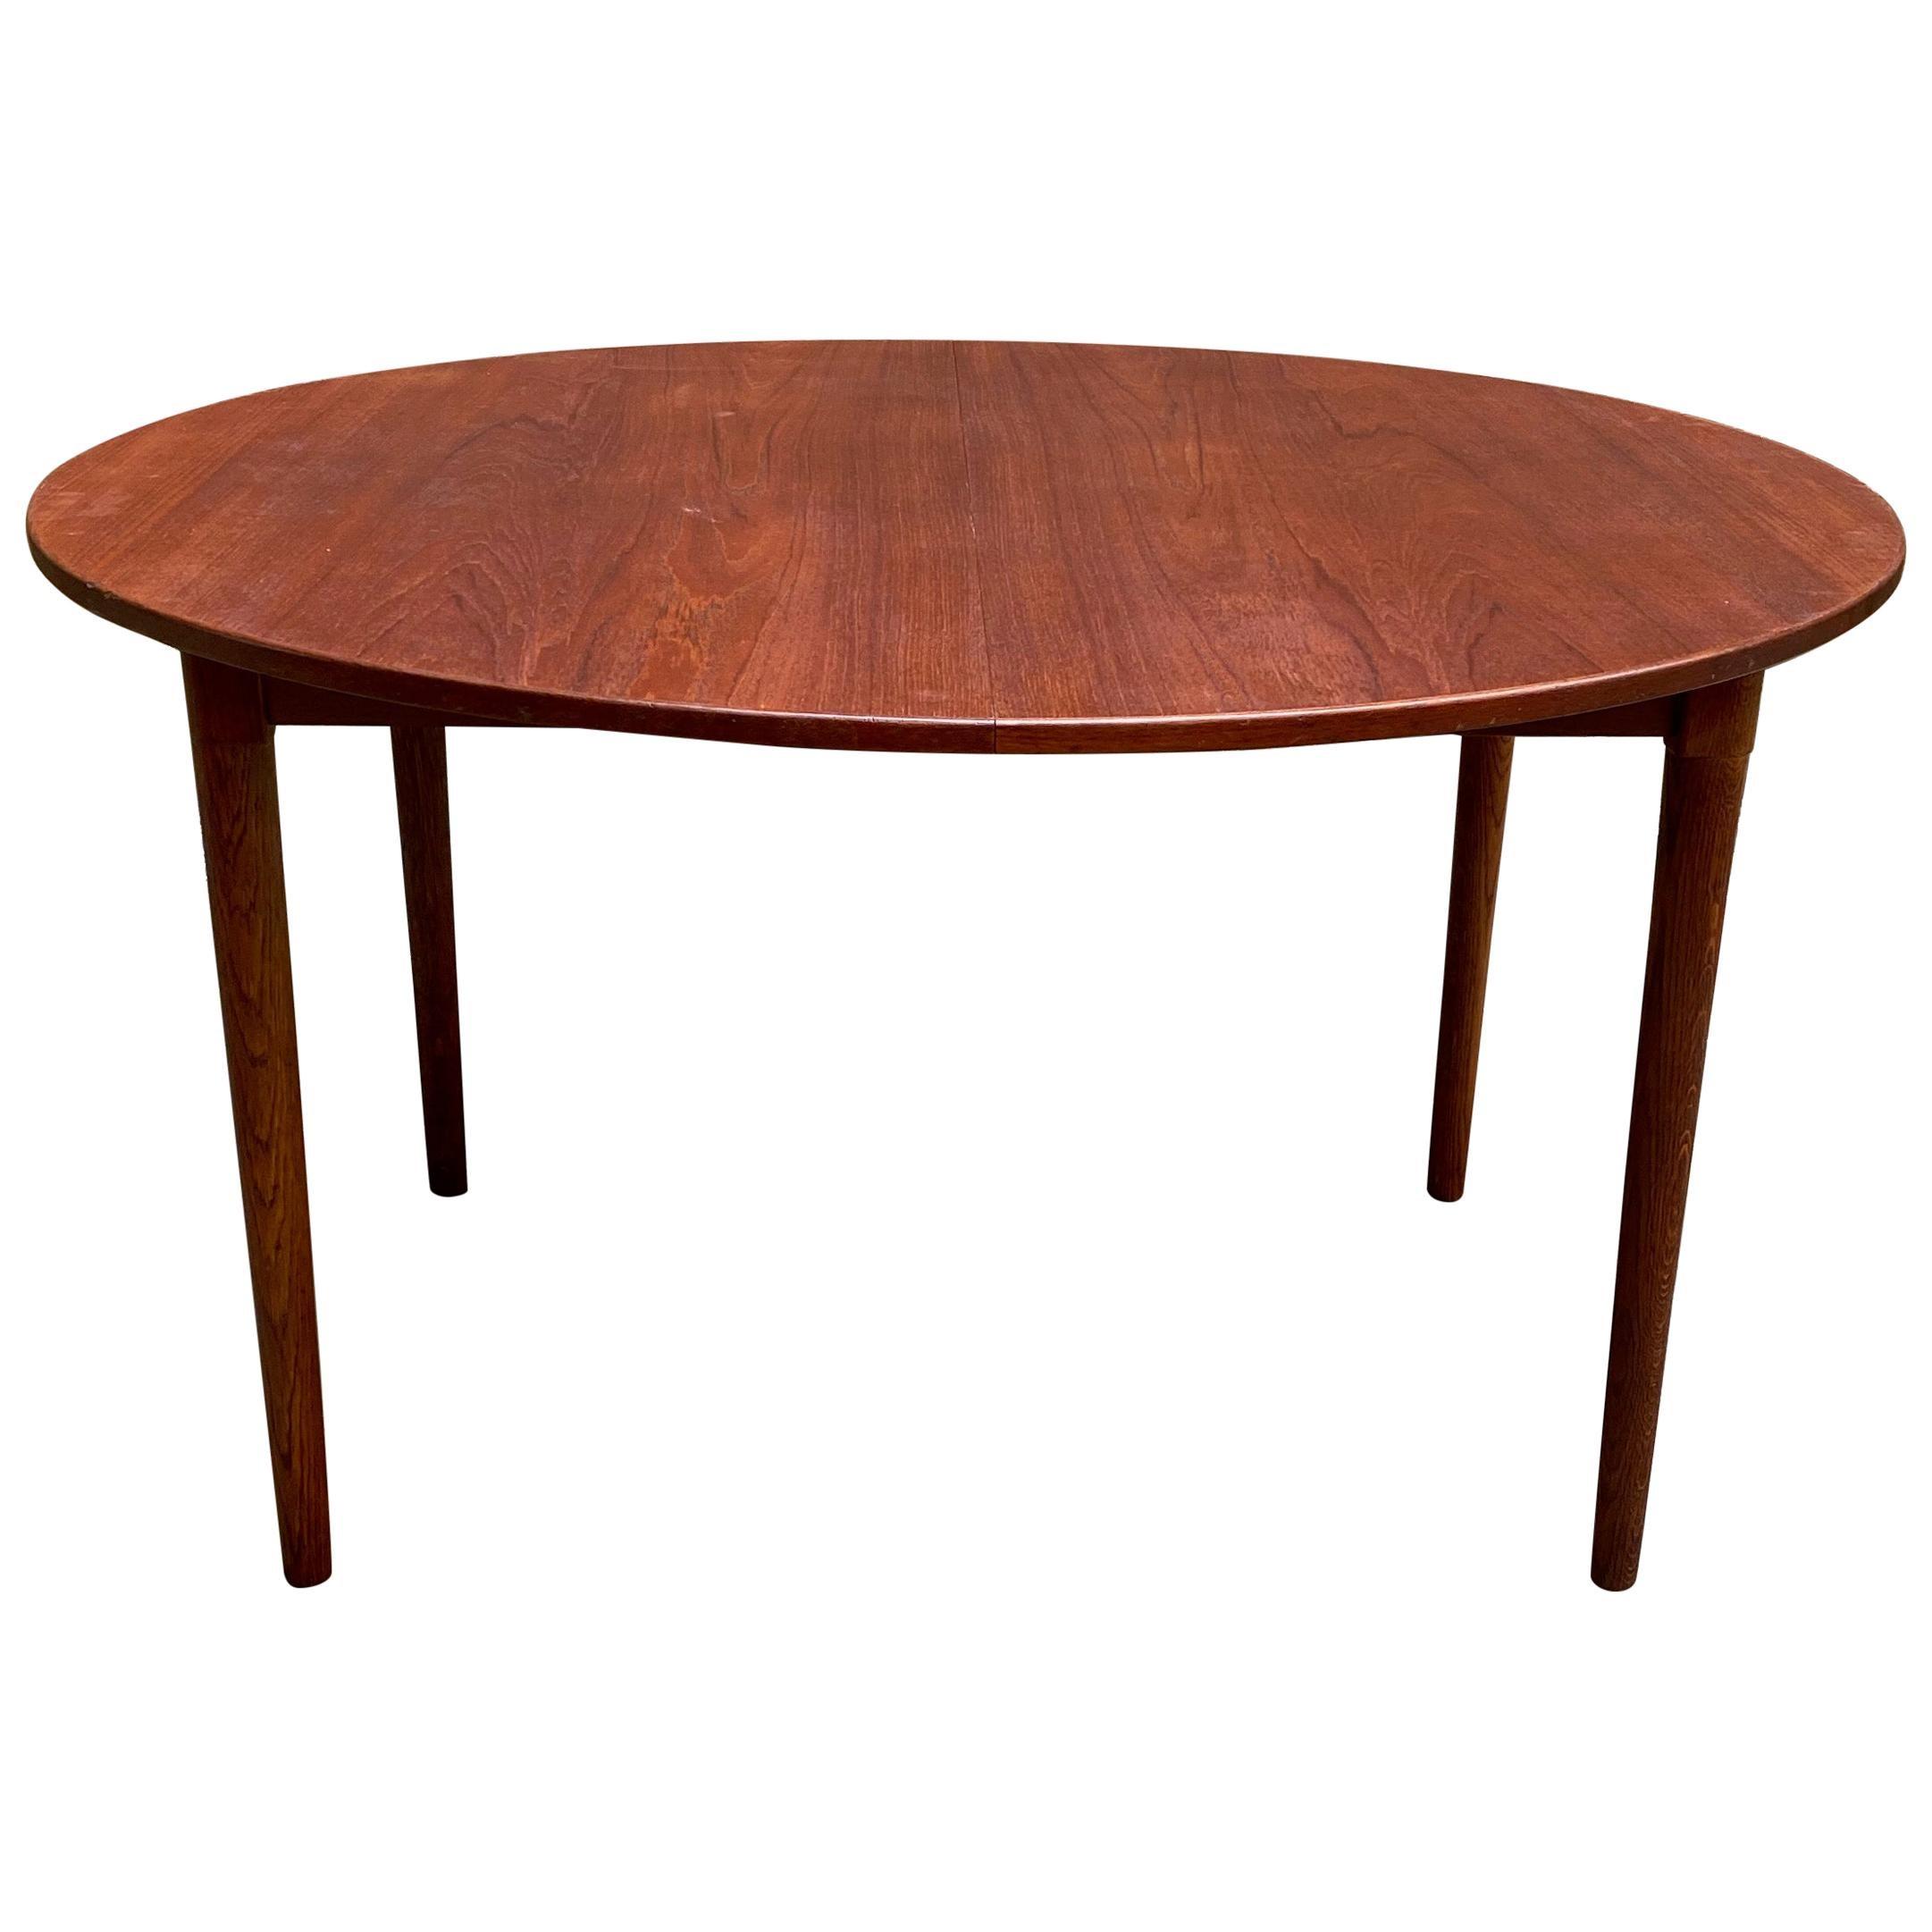 Scandinavian Modern Teak and Oak Dining Table